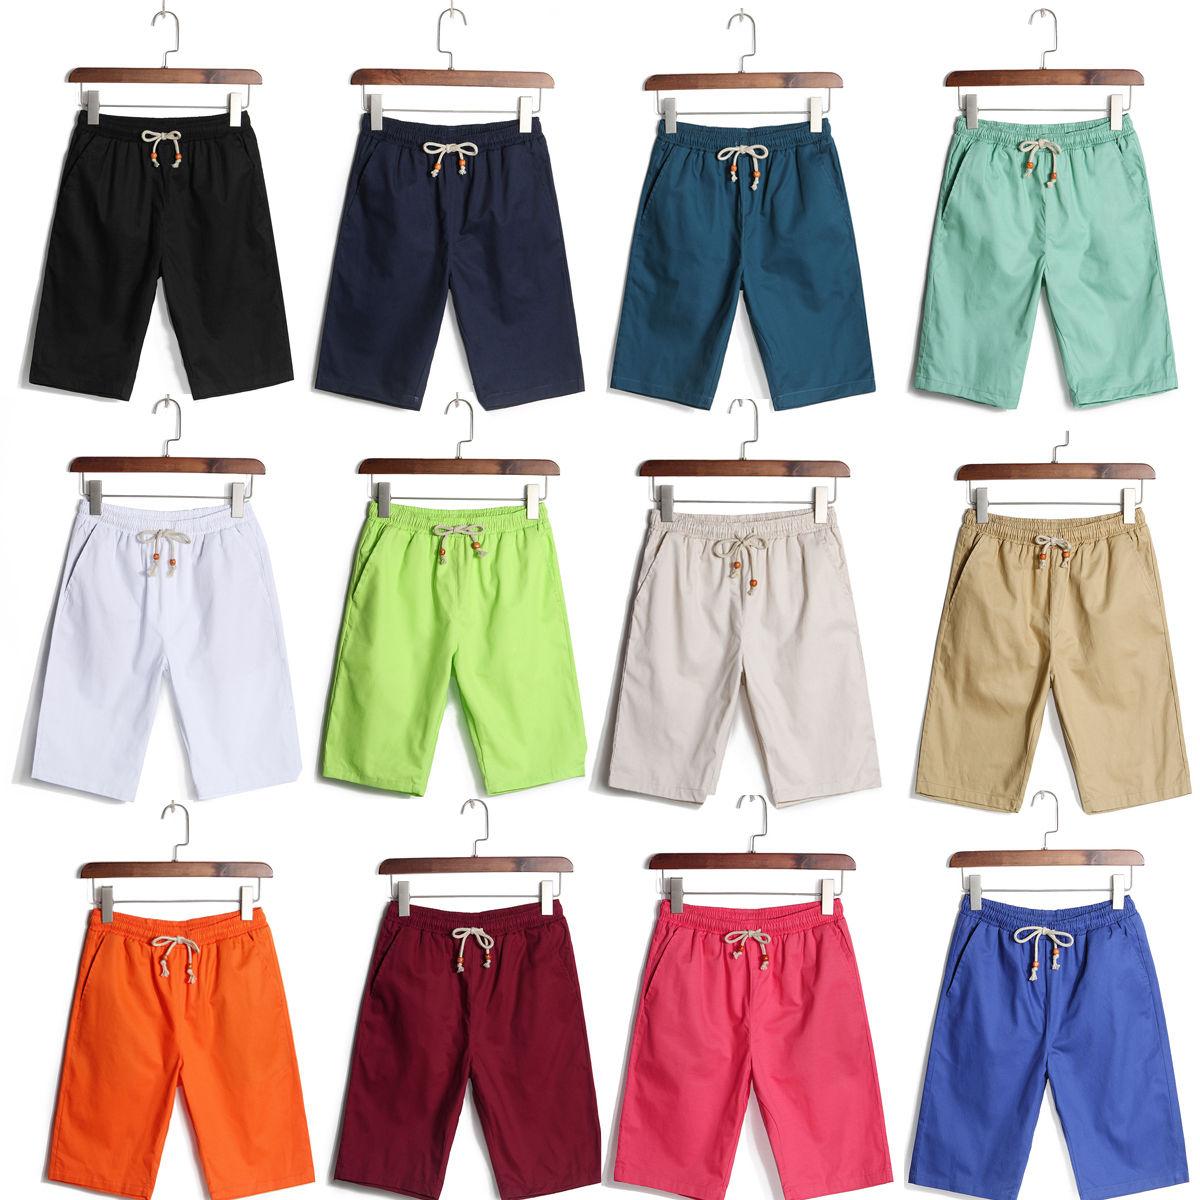 8d1a2e92cd Outdoor Sports Plain Men Boy Board Surf Swimming Swim Beach Shorts Trunks  Pants Holiday sport leisure